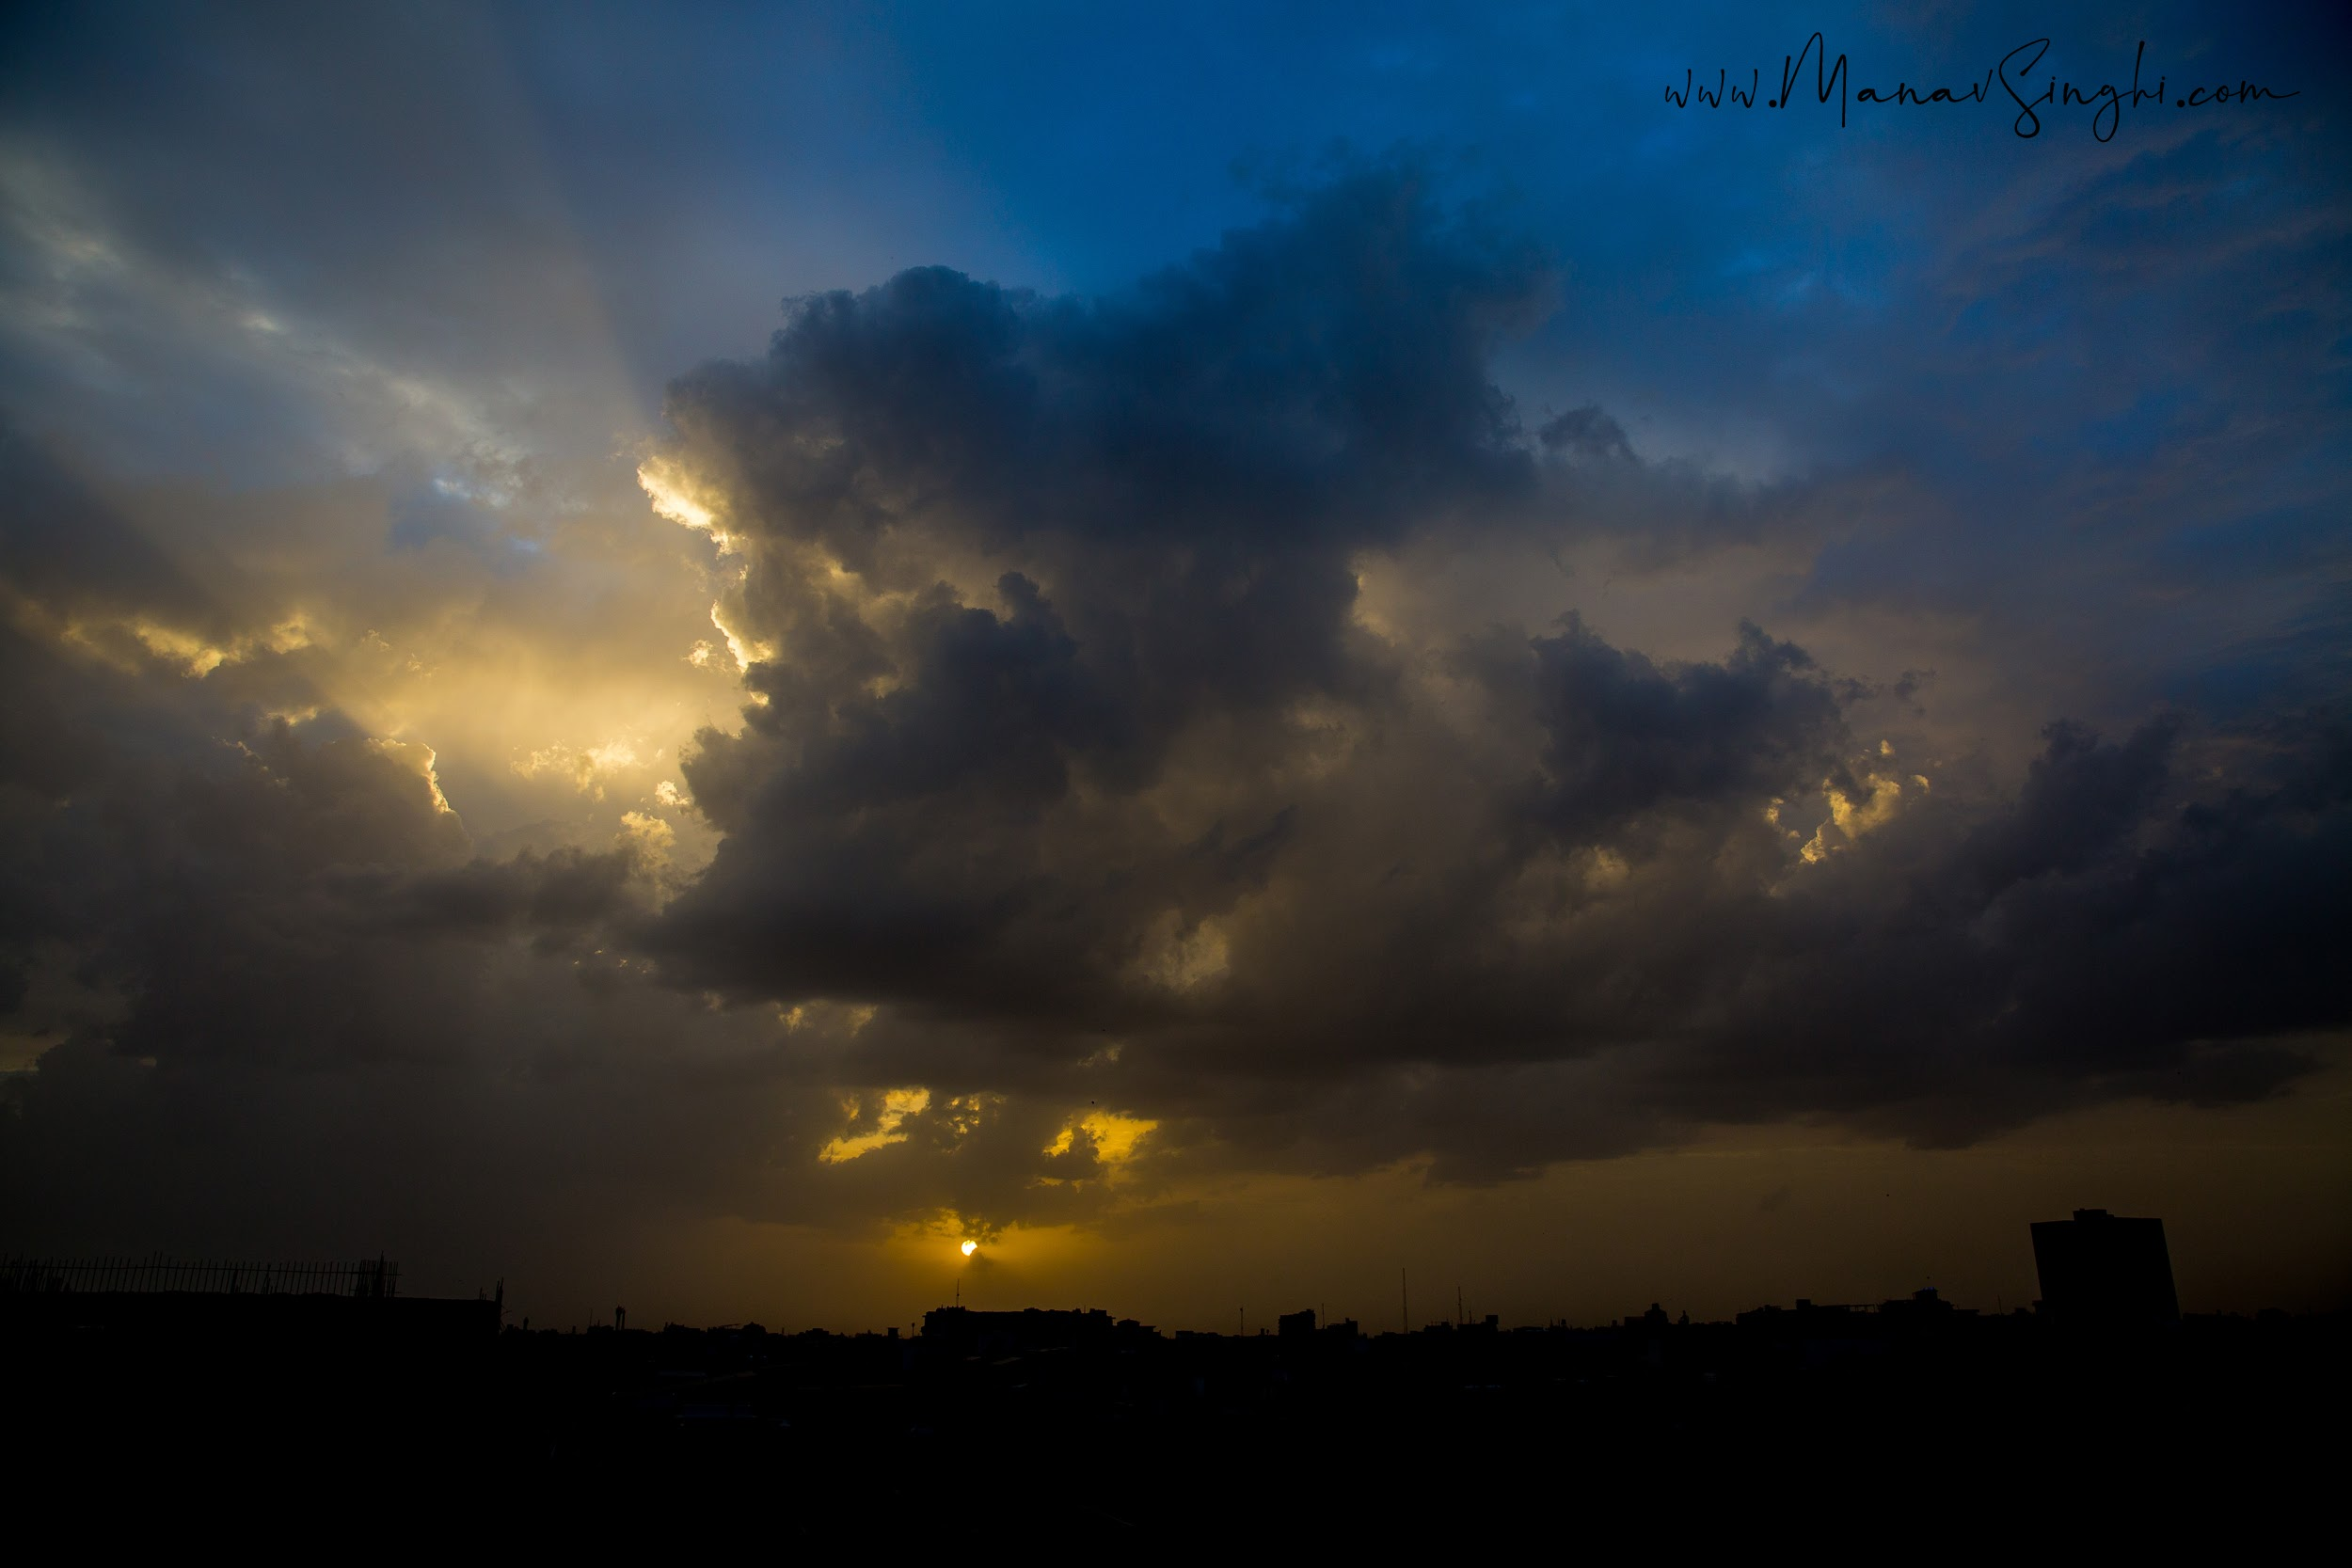 Today's Sunset - Jaipur